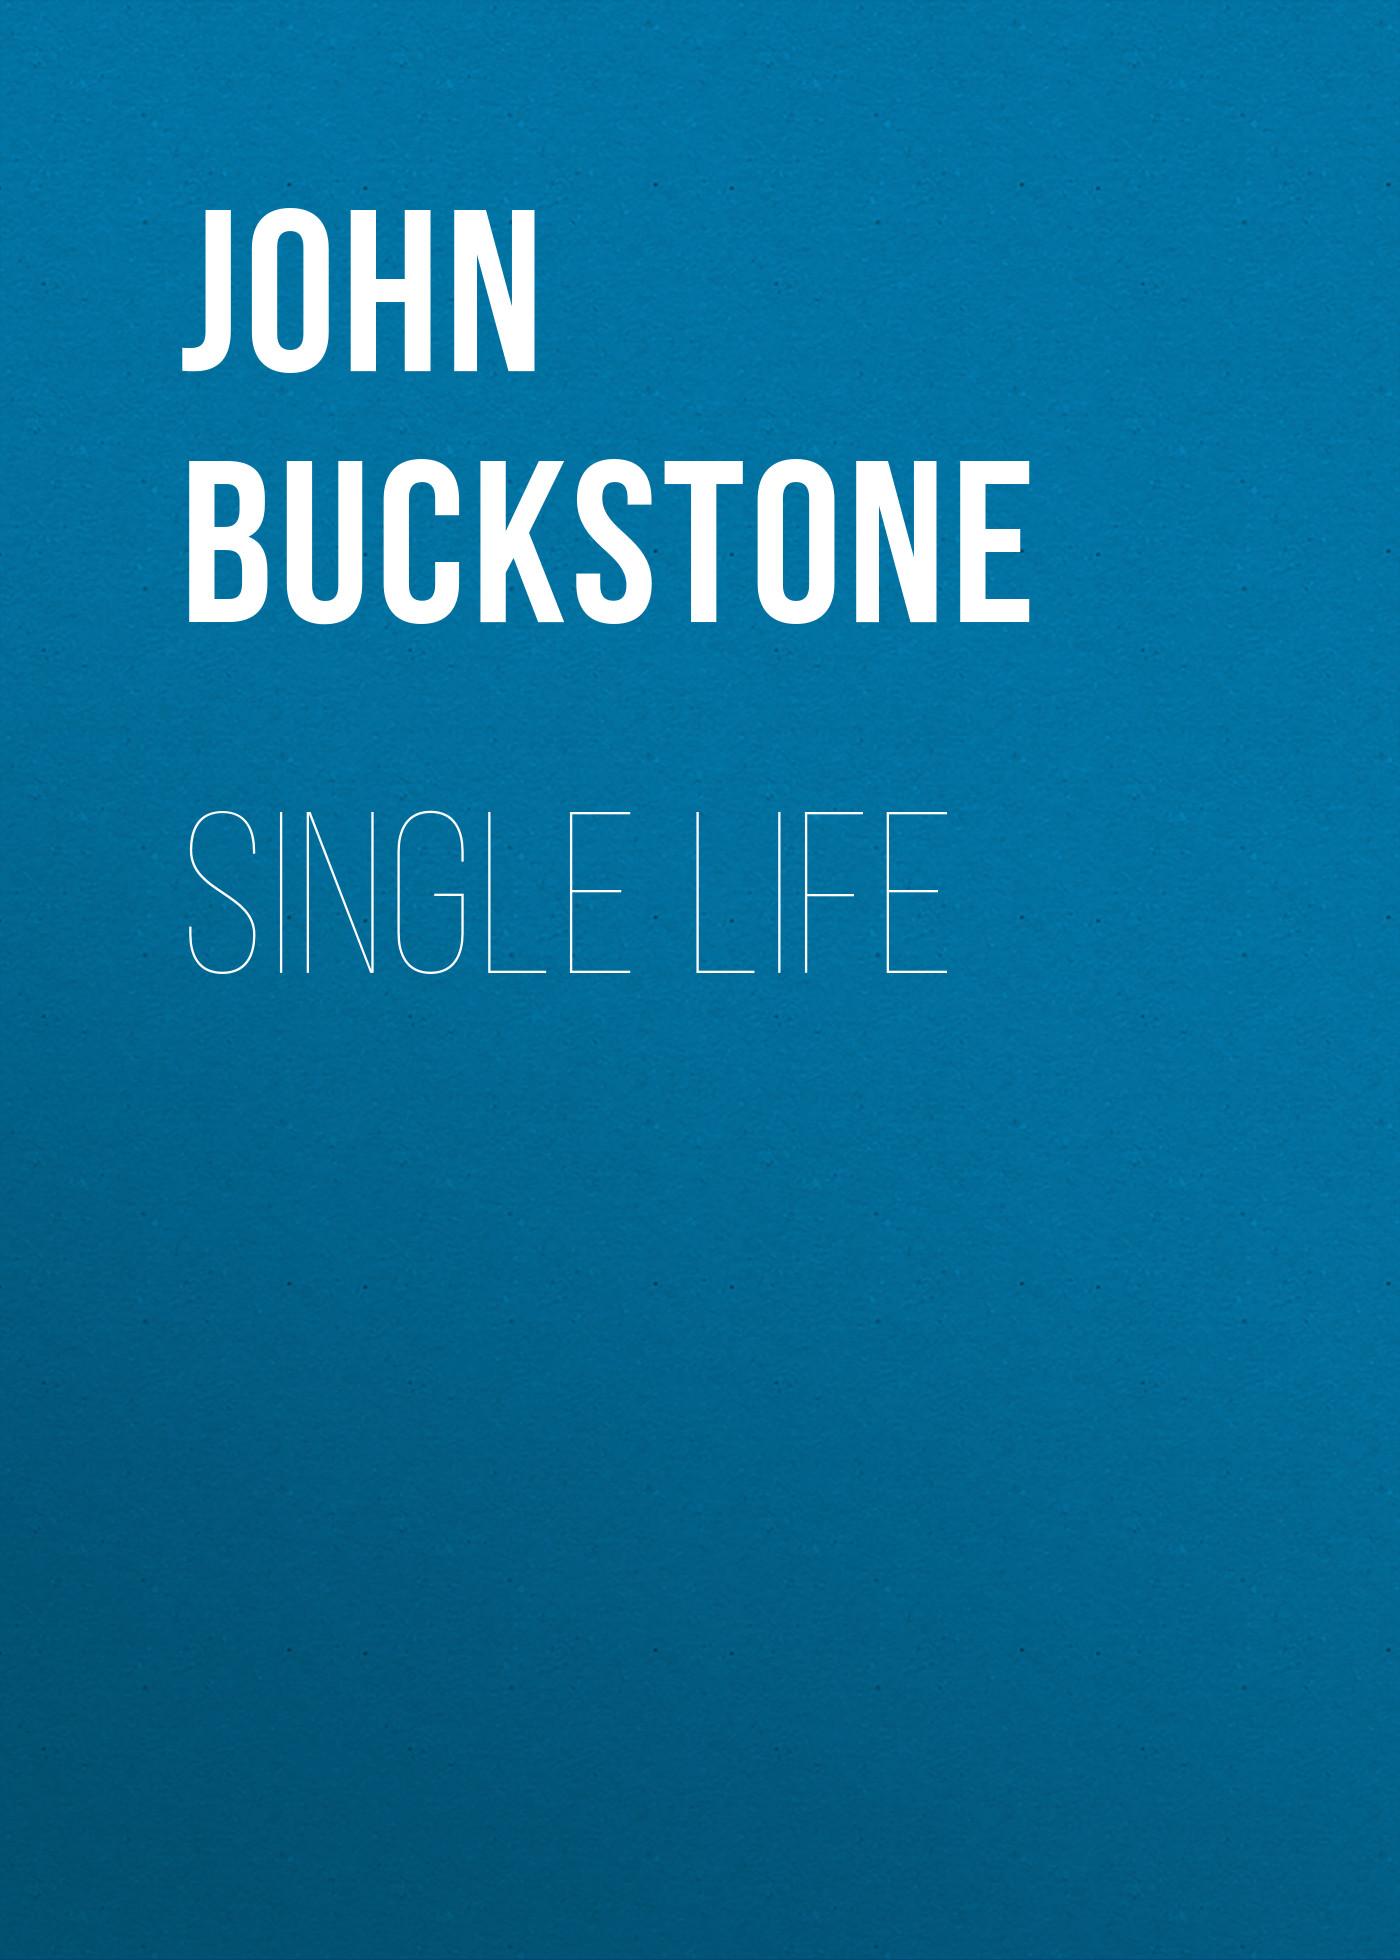 Buckstone John Baldwin Single Life buckstone john baldwin single life